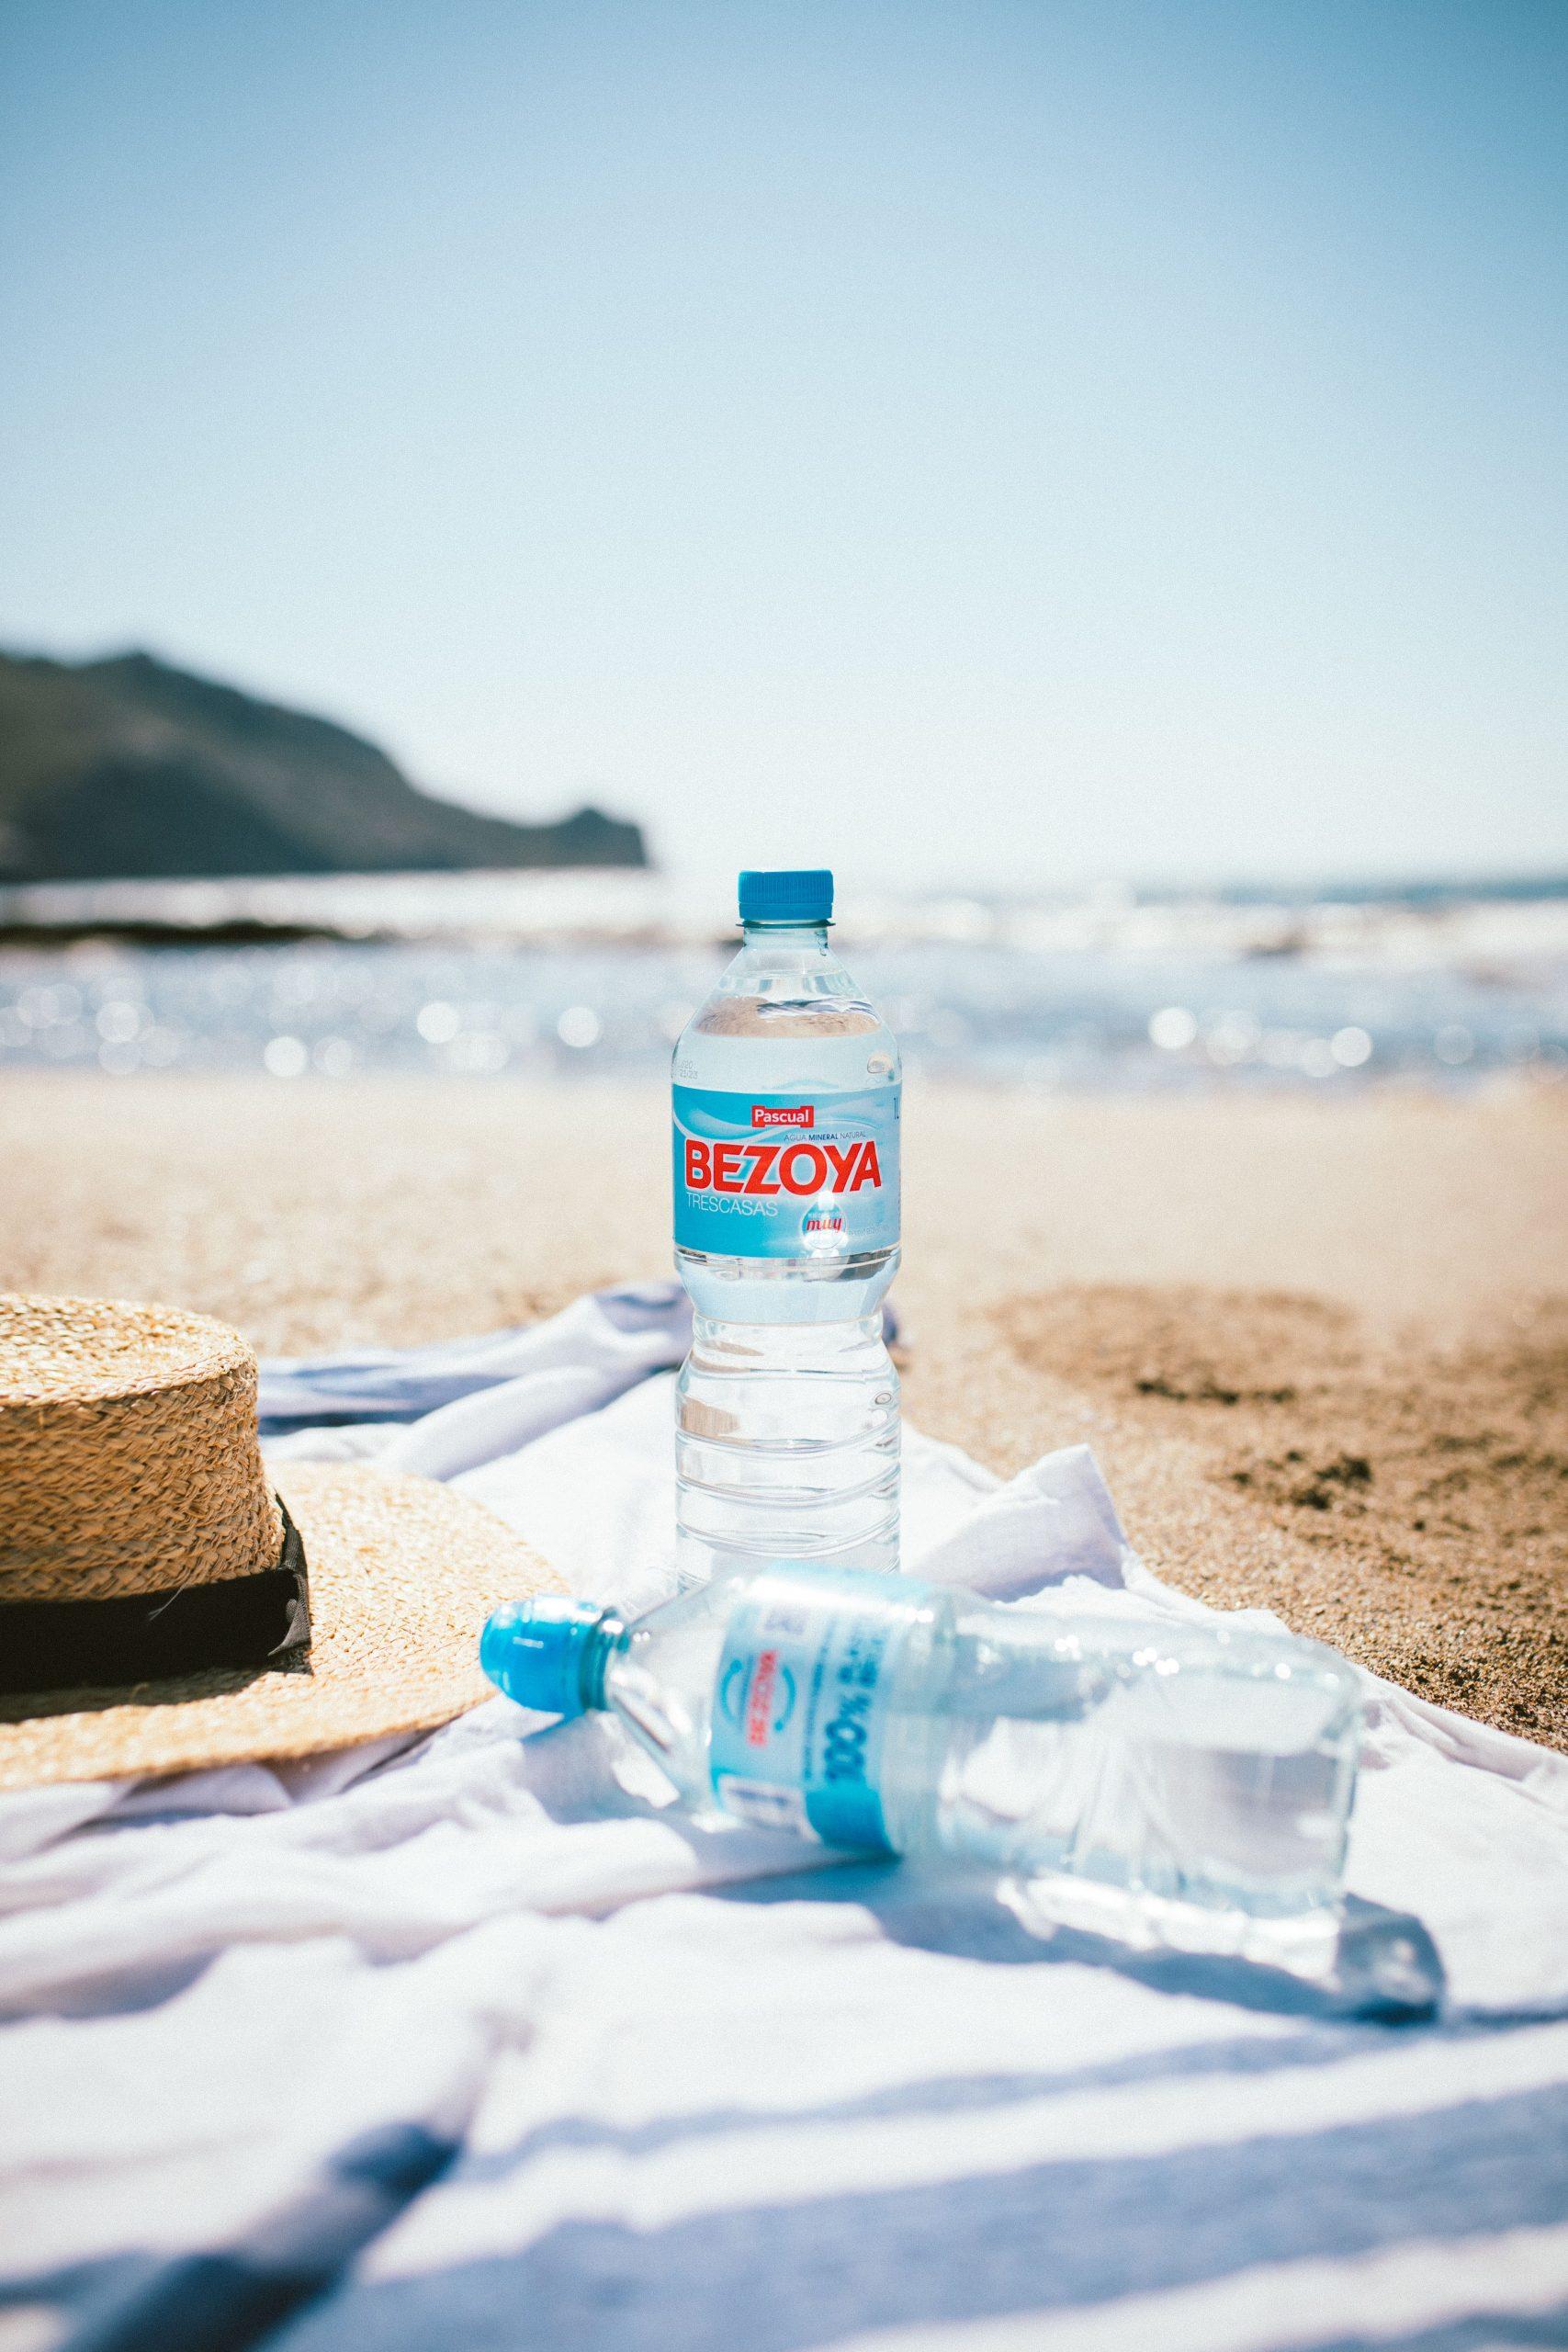 Bezoya 1 litro